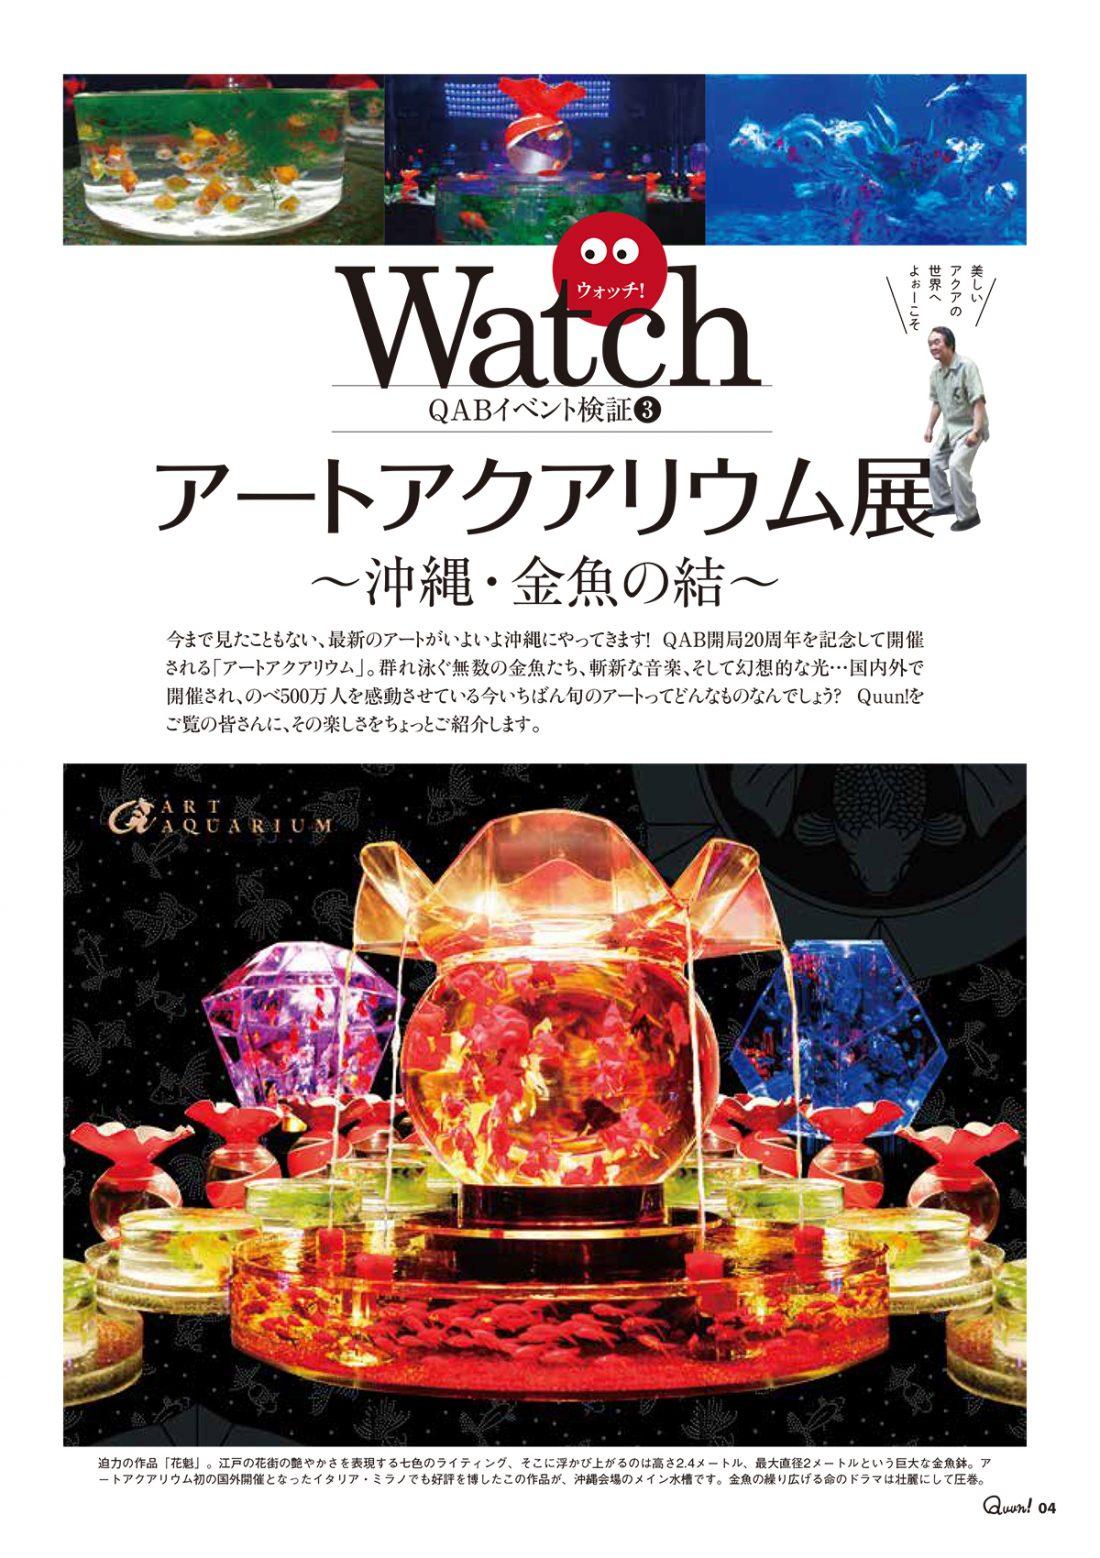 http://www.qab.co.jp/qgoro/wp-content/uploads/quun_0406-1100x1558.jpg